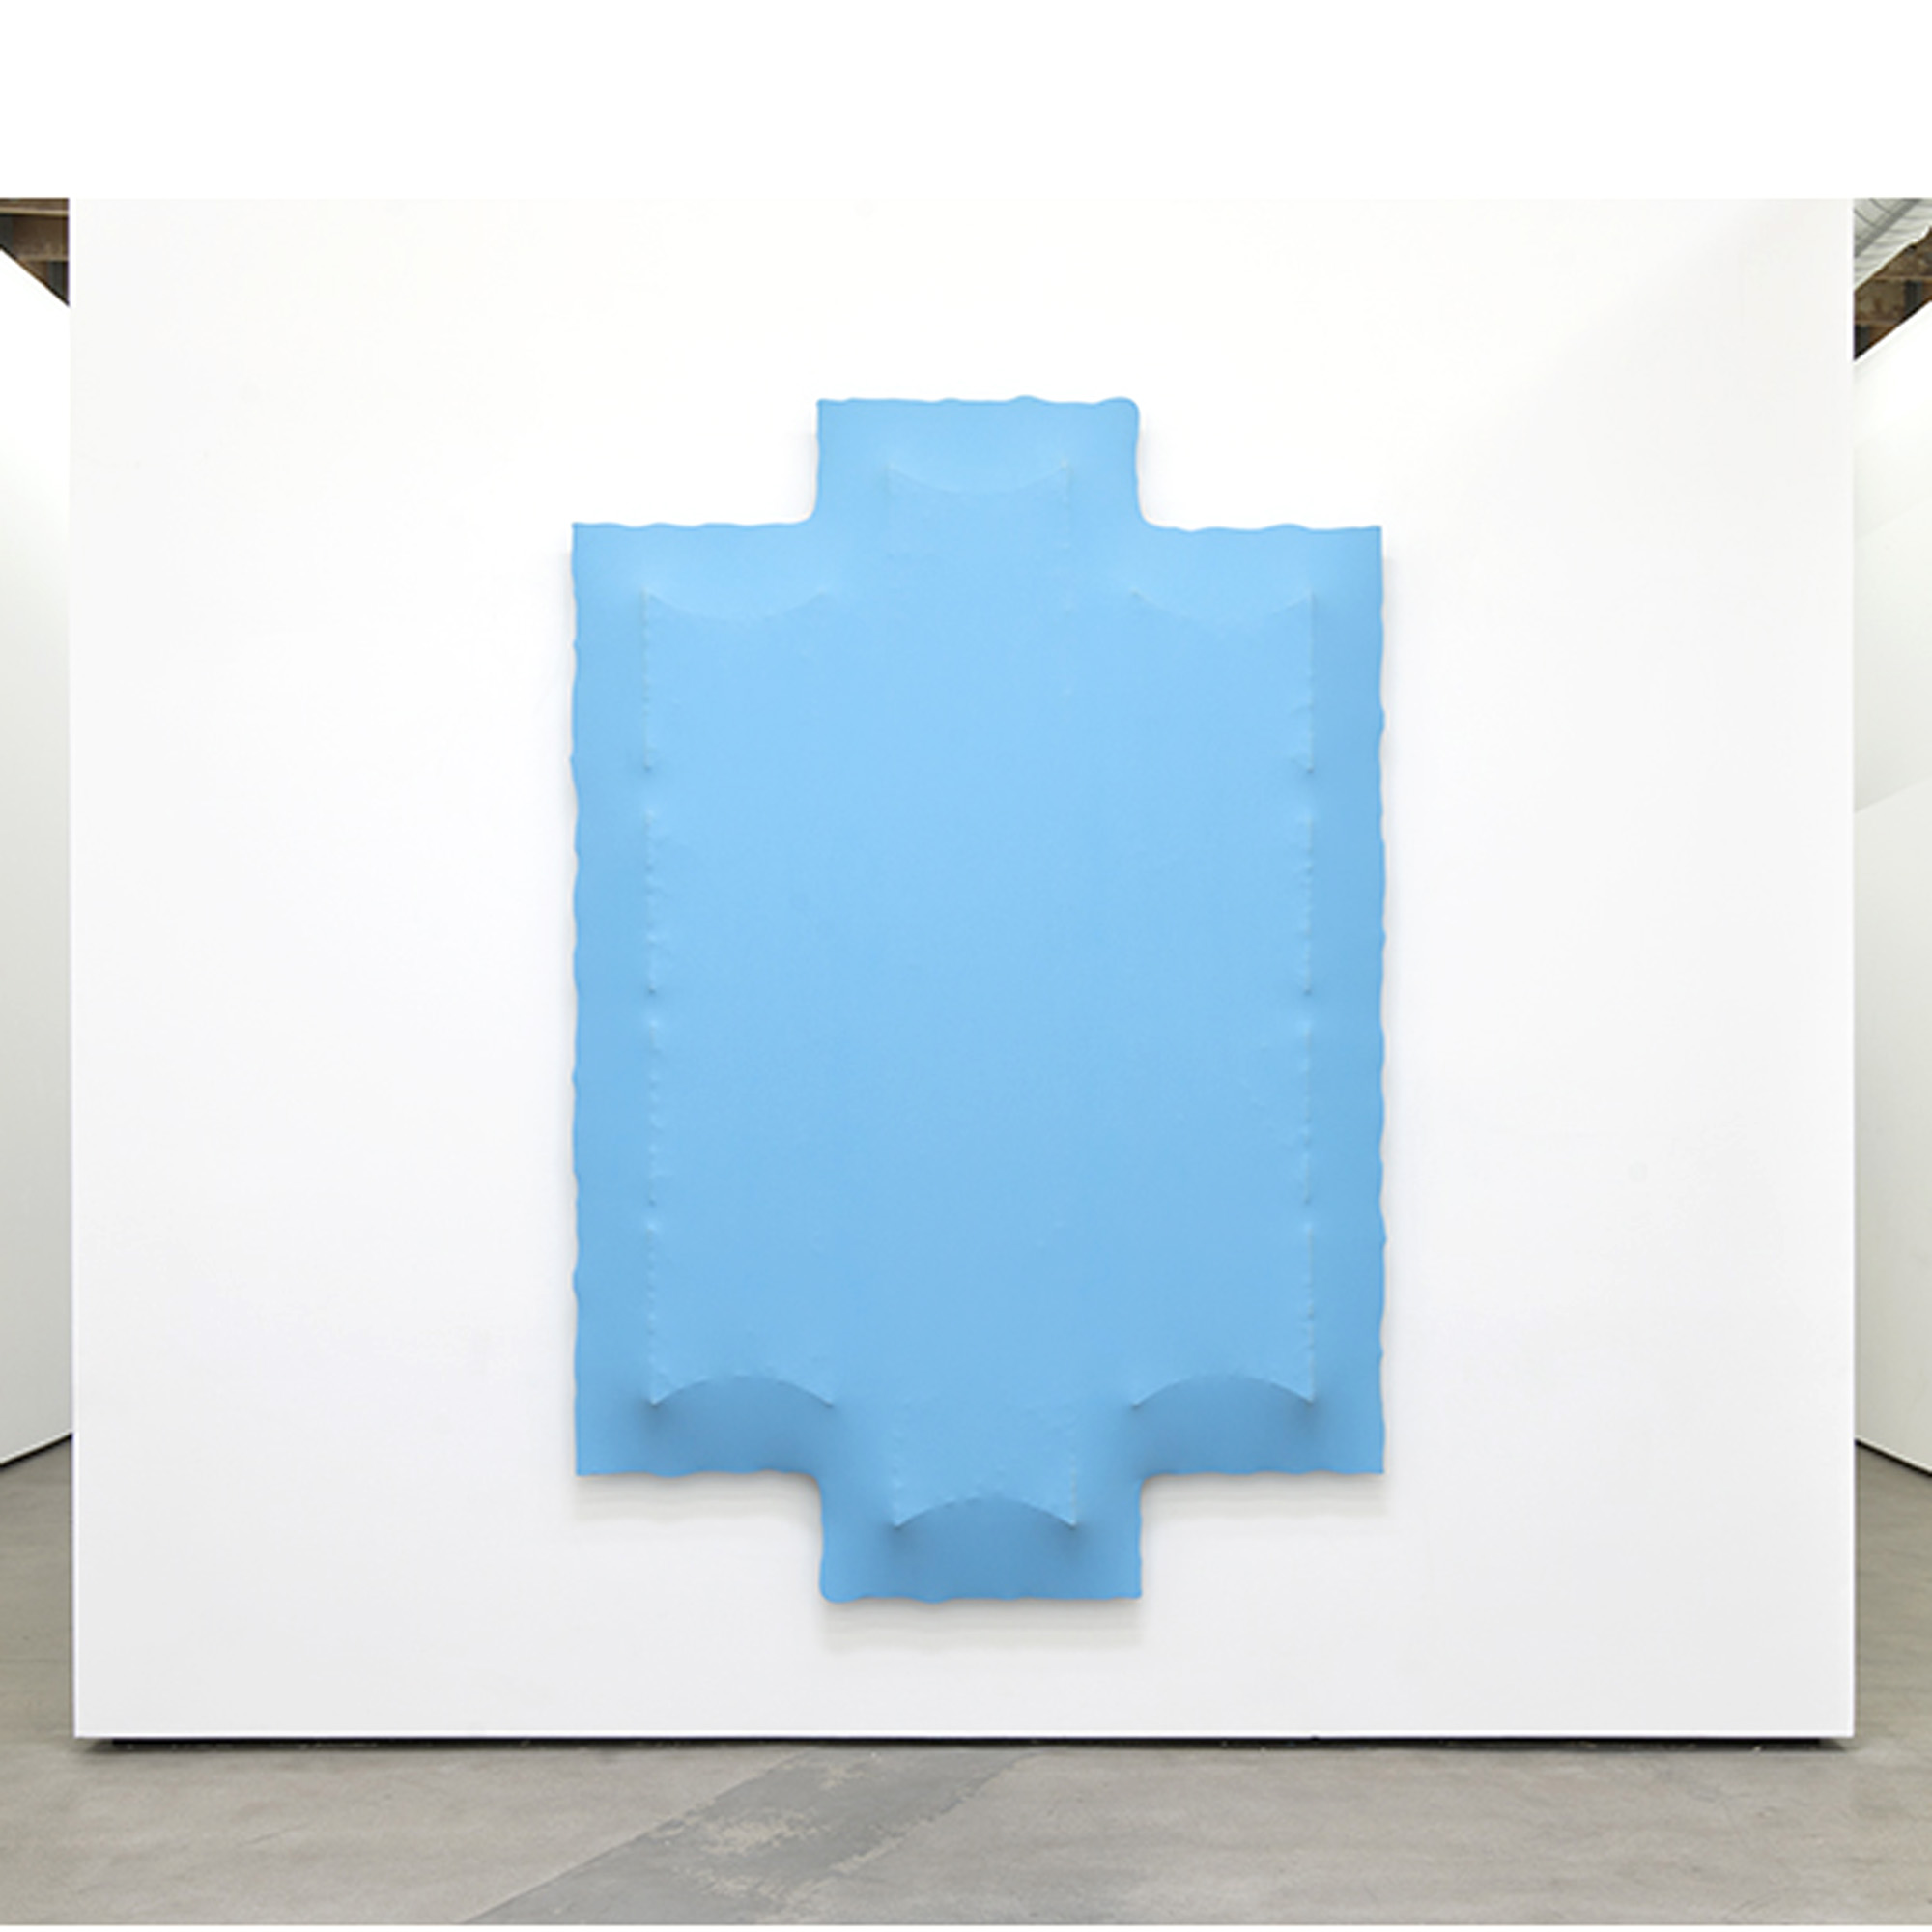 Jennifer_Boysen_Transmutes_Cherry and Martin Morgan Concrete Art Advisory London MCAAL.jpg